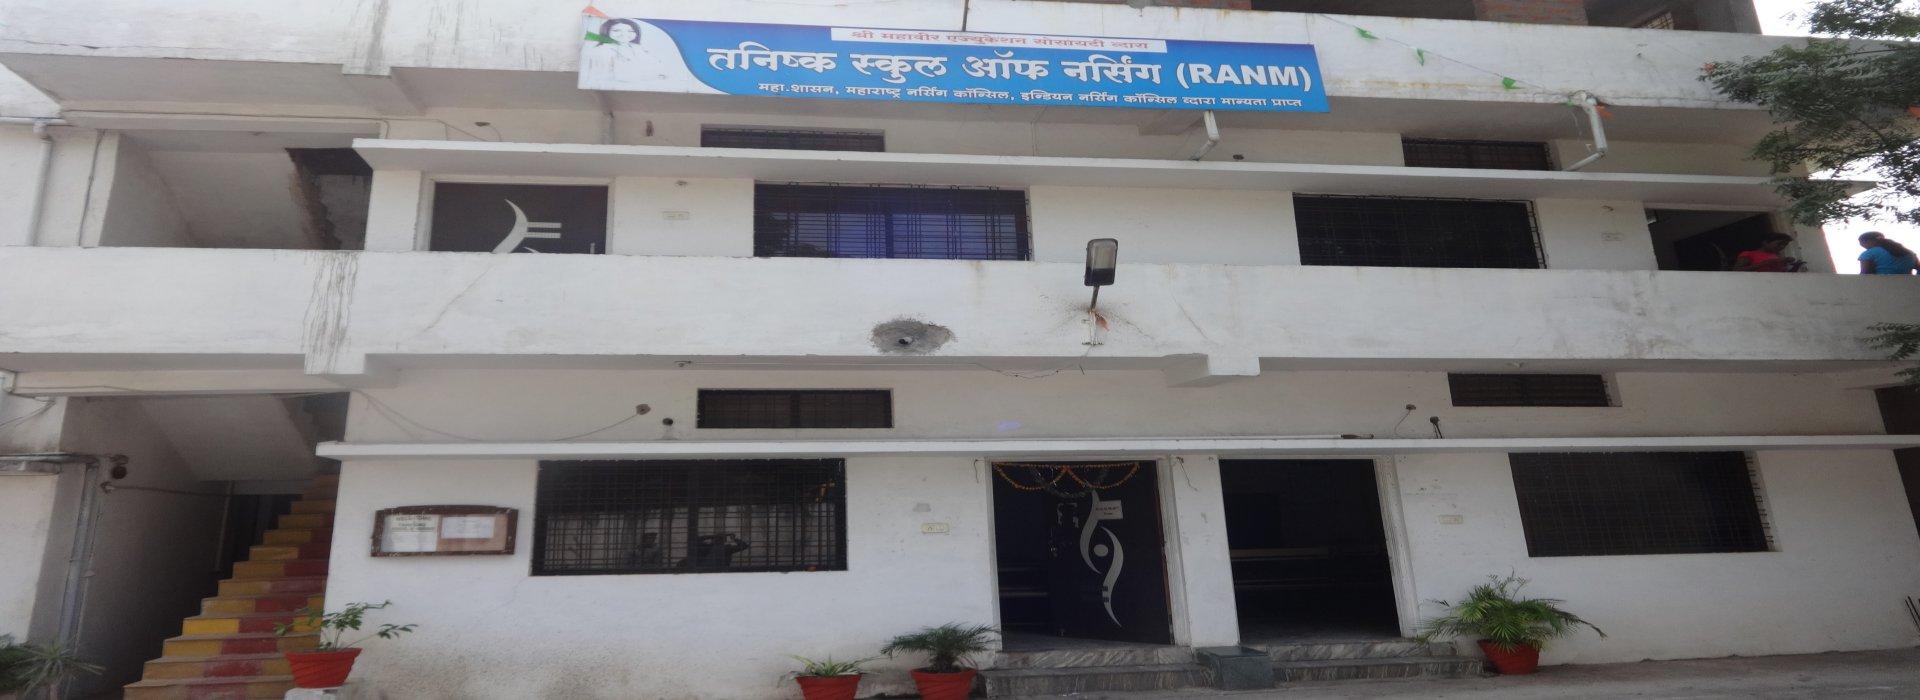 Tanisq School Of Nursing, Nagpur Image